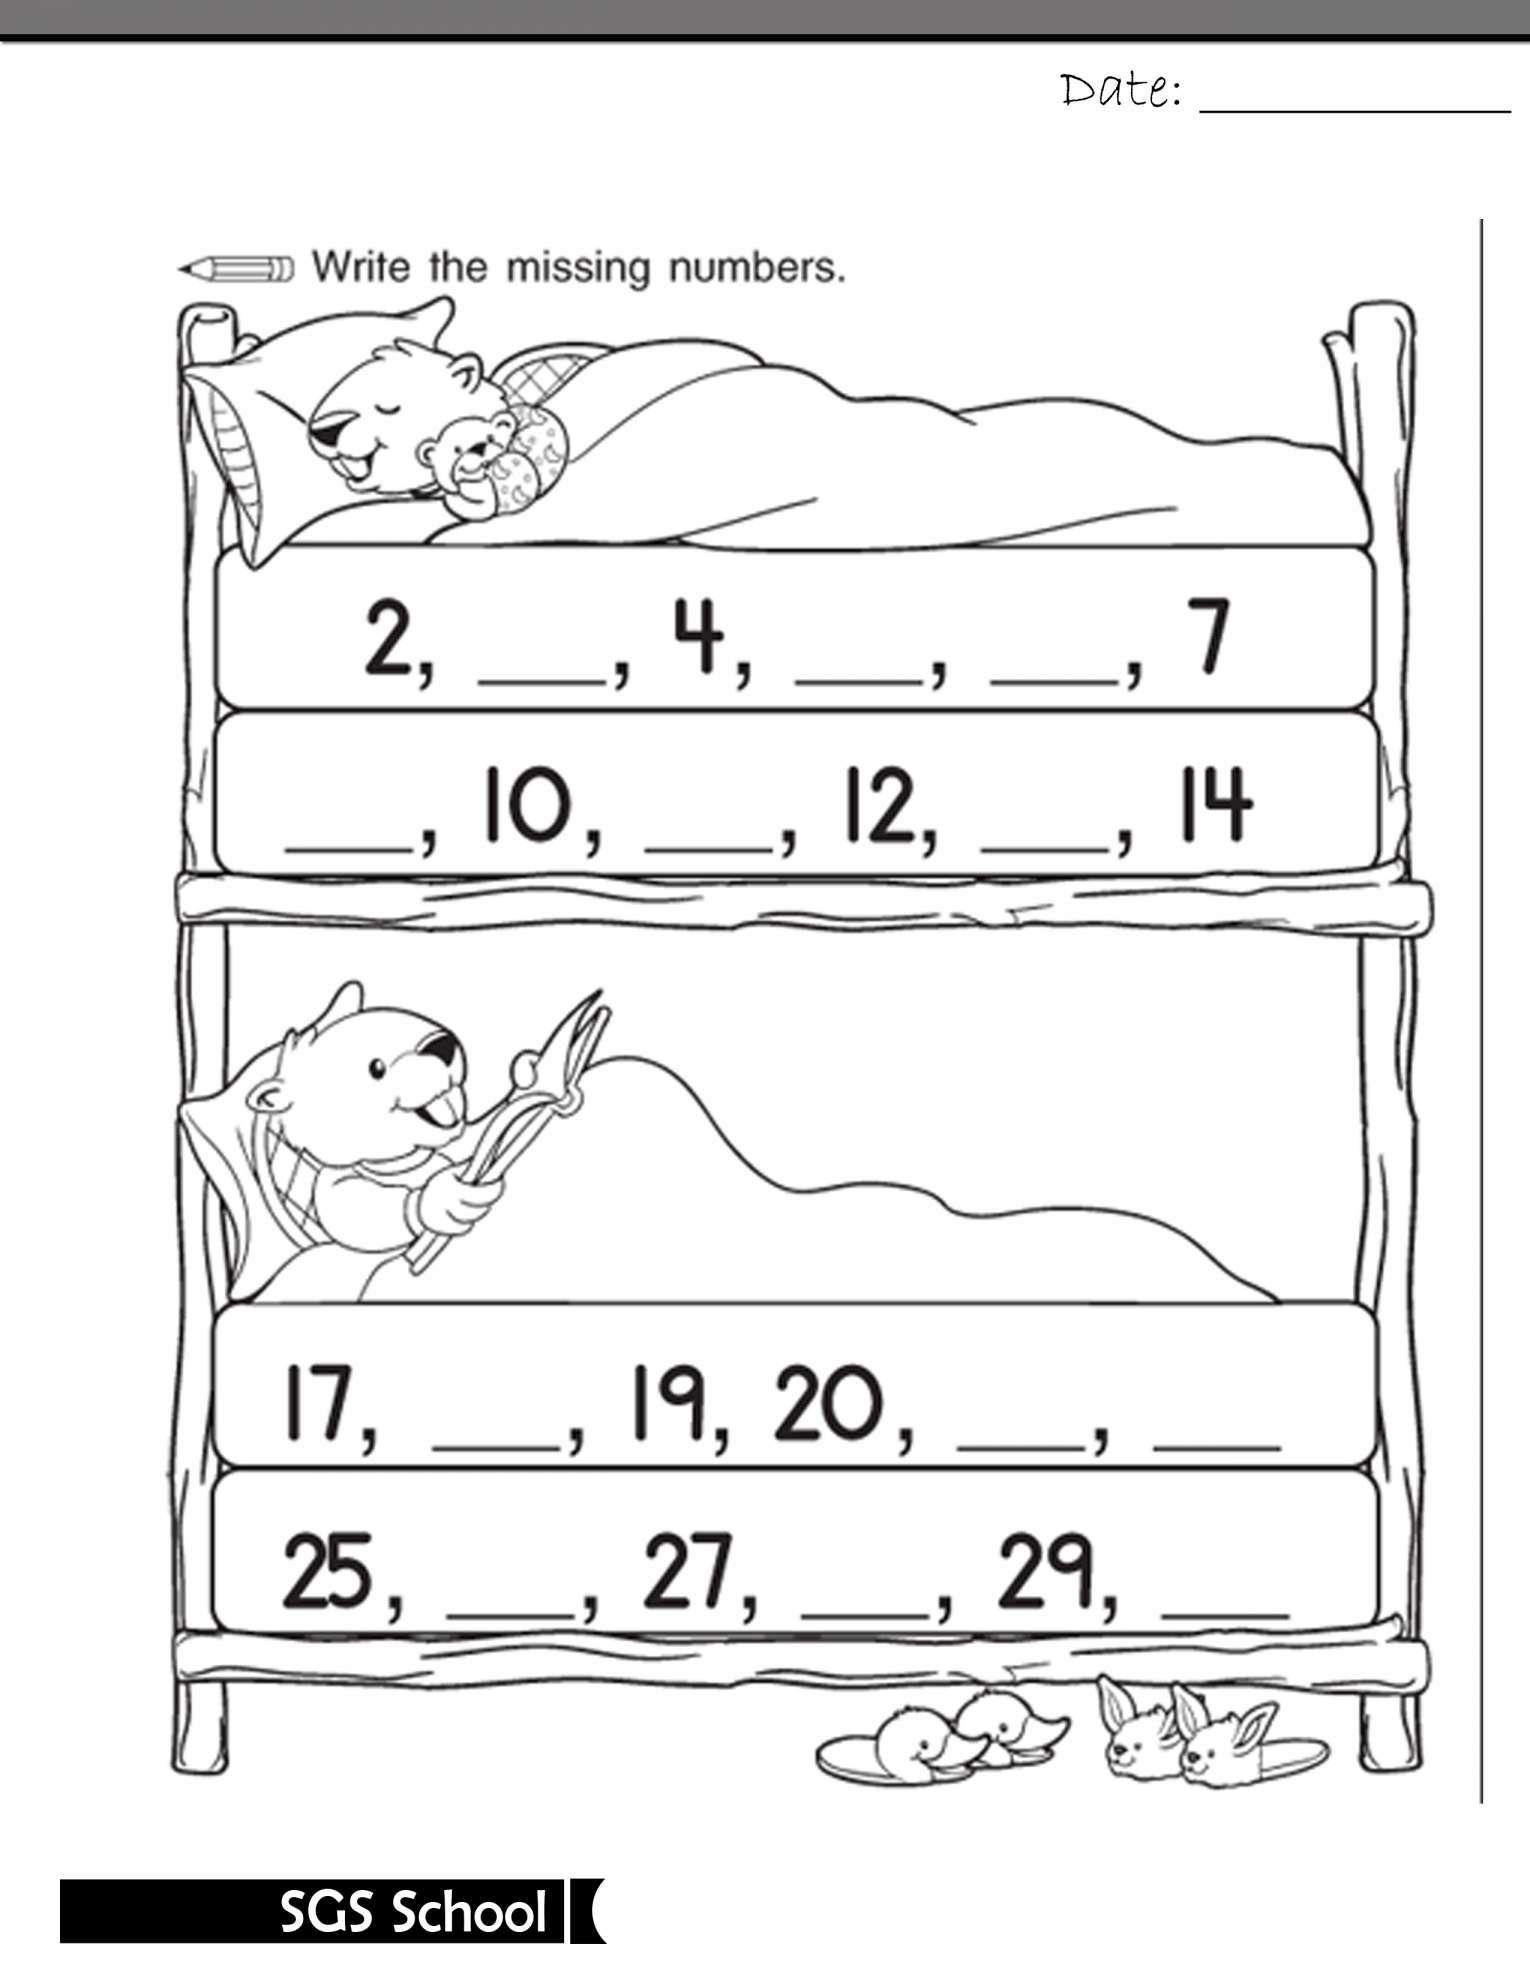 Urdu Worksheet For Kindergarten And Worksheet Of Urdu For